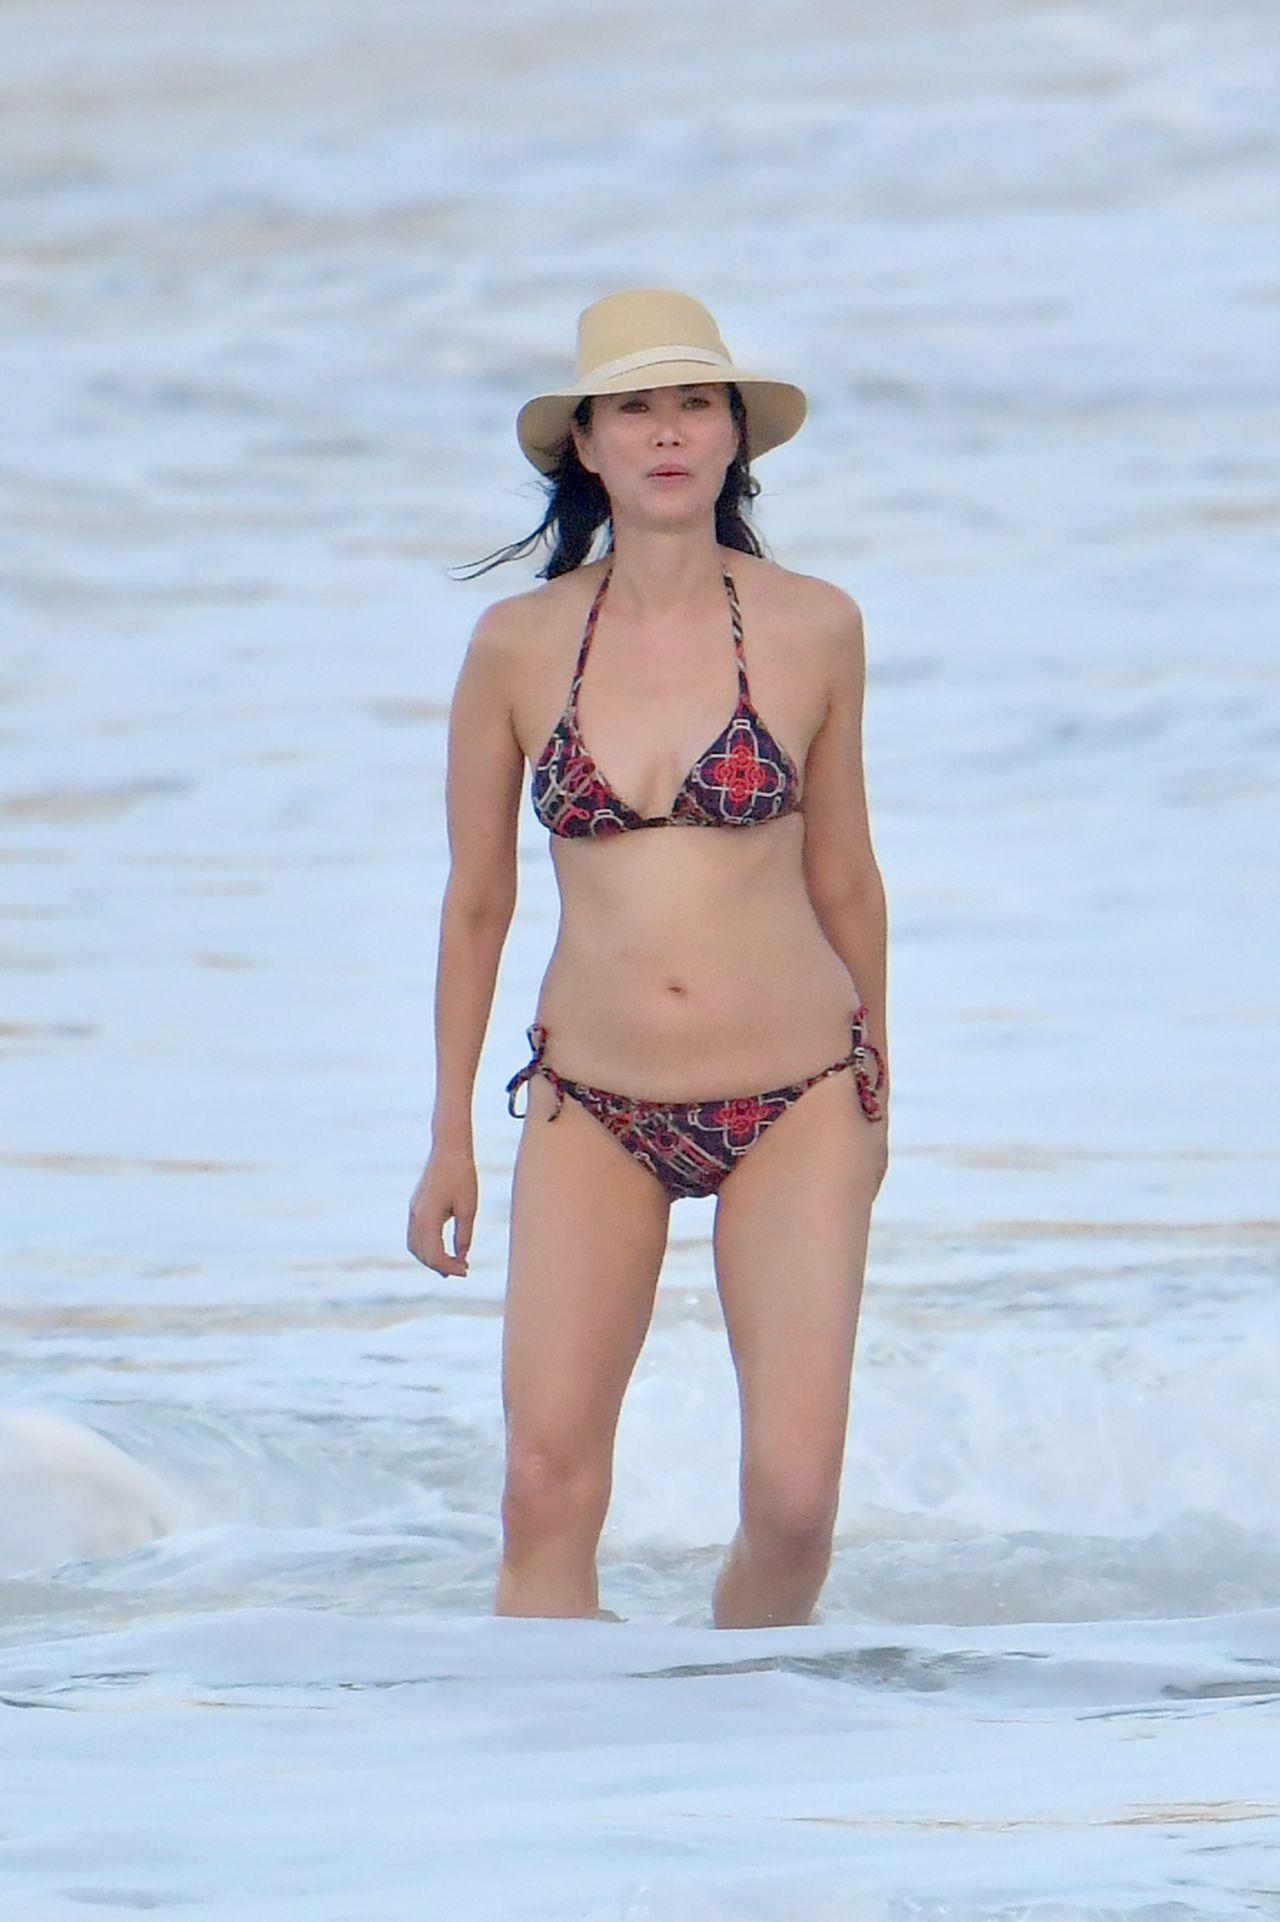 Wendi Deng Murdoch Bikini Nude Photos 39